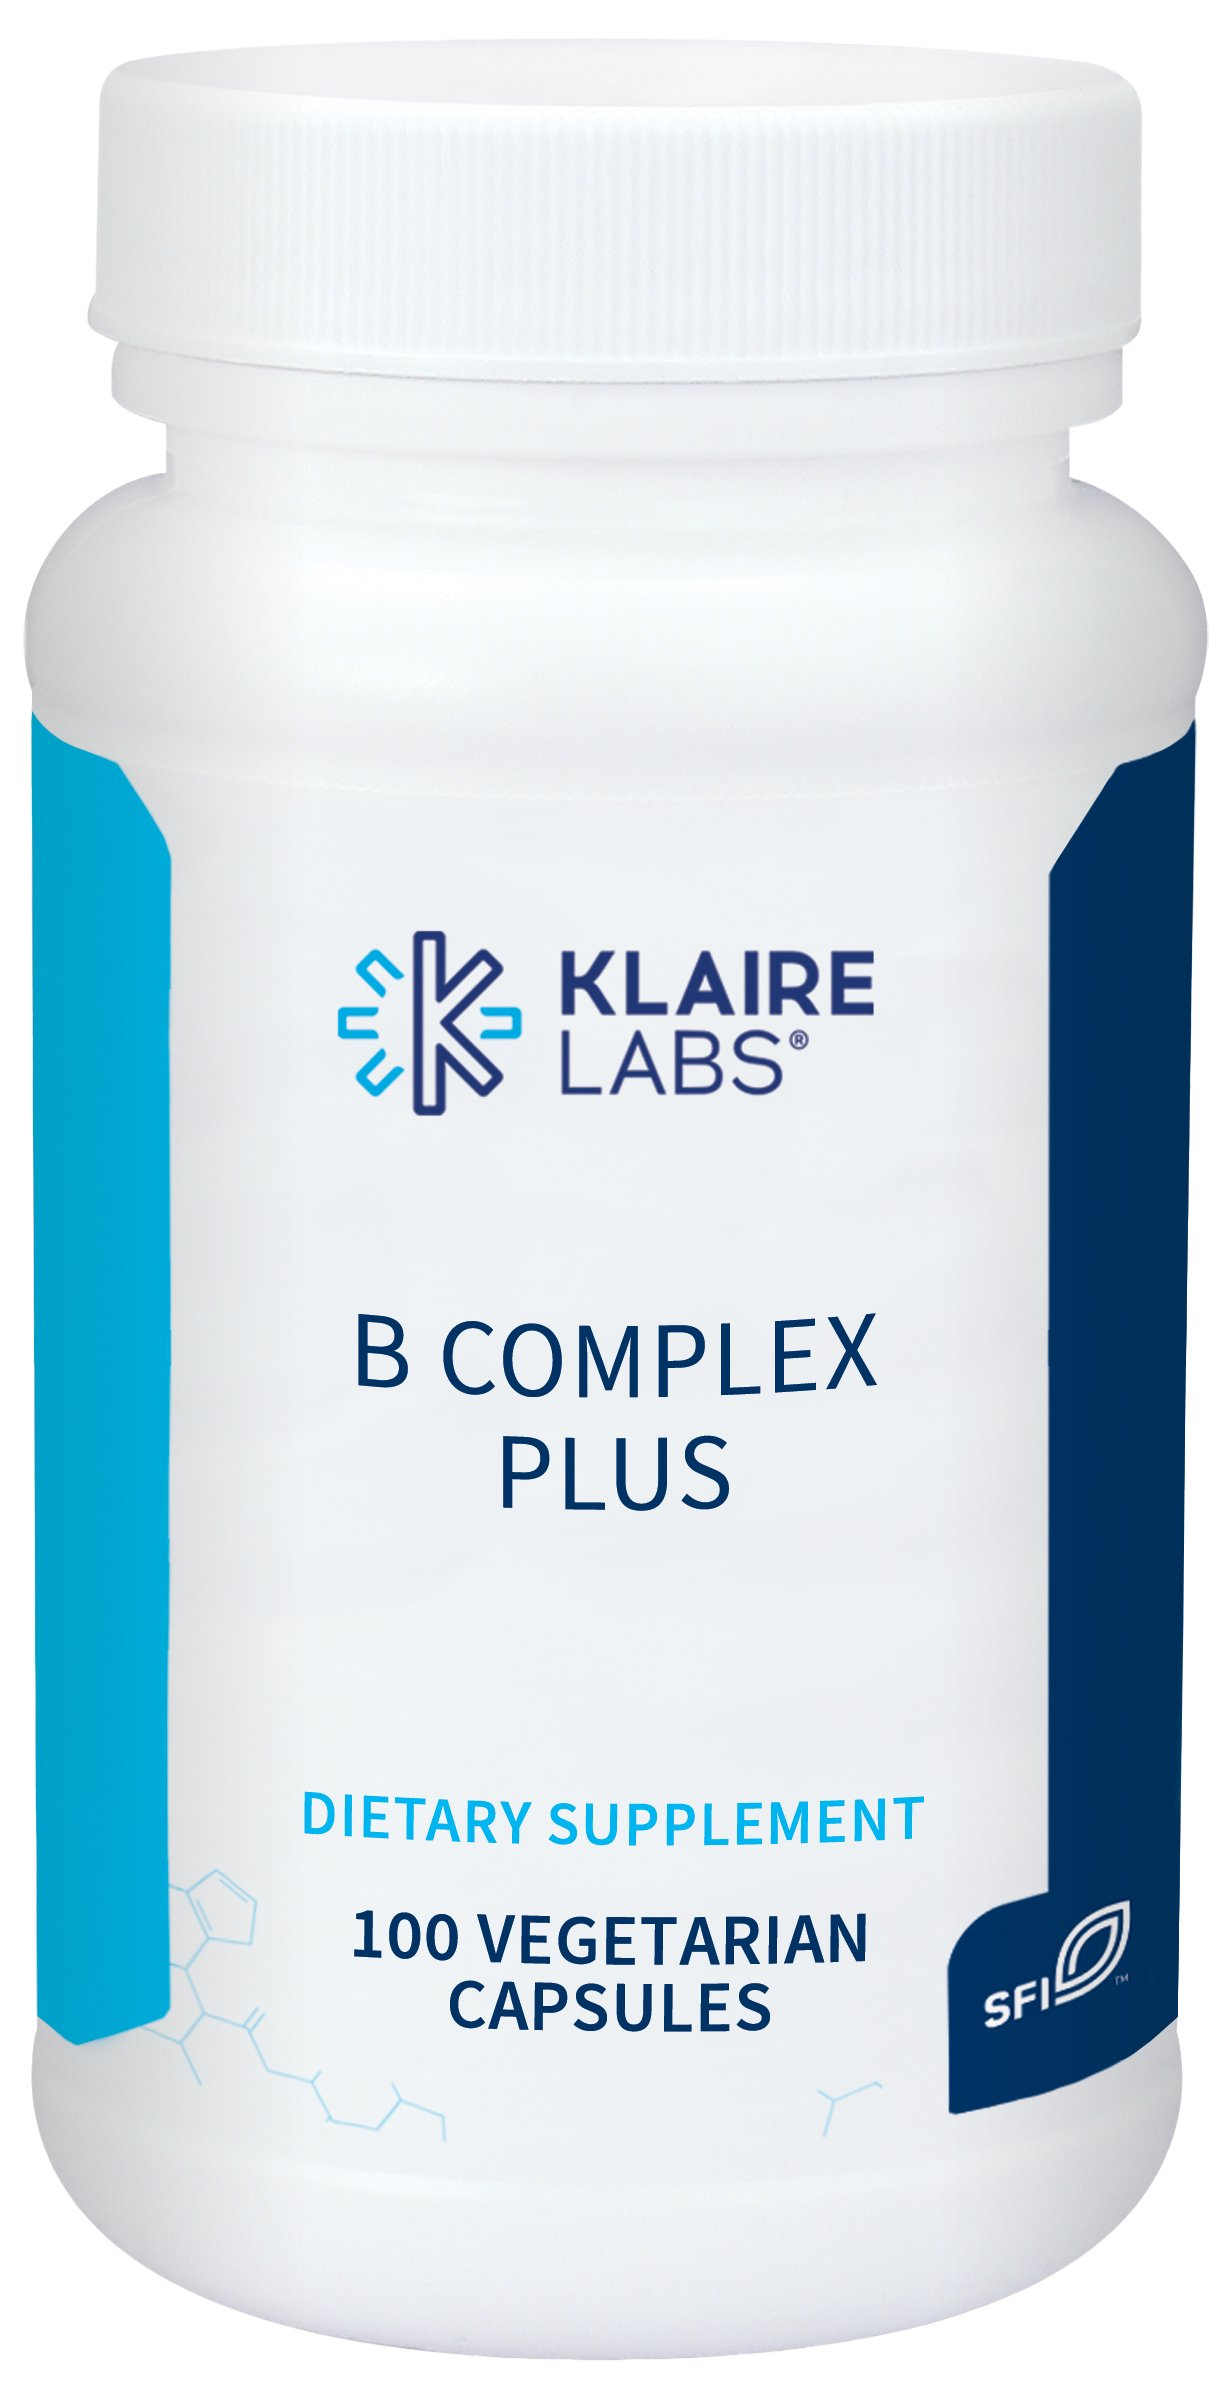 Klaire Labs B Complex Plus - High Potency B Vitamins with Metafolin Folate & Methylcobalamin, 100 Capsules